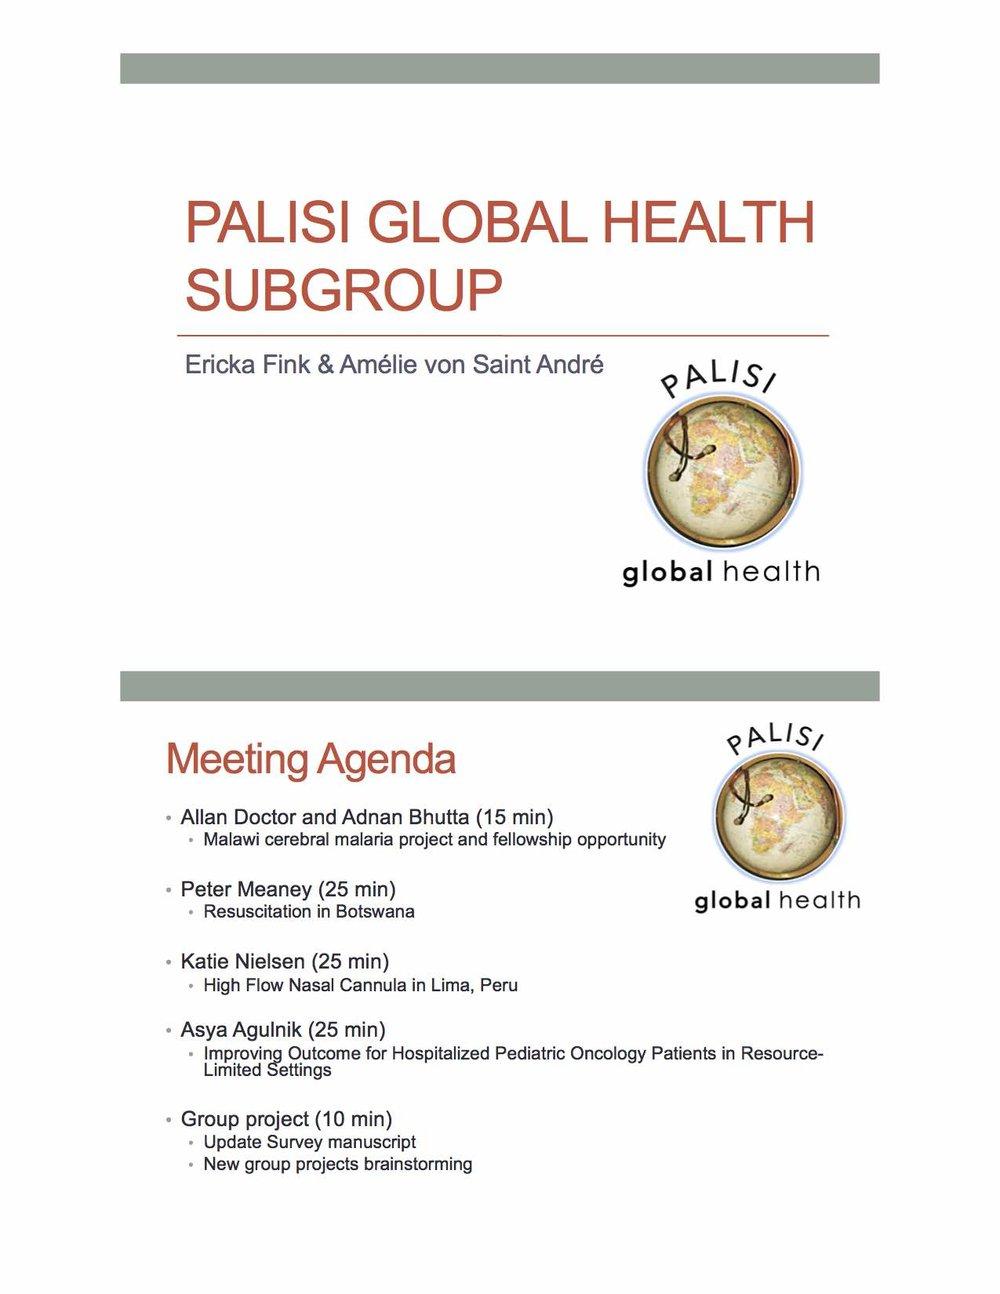 PALISI GH Summary 9-15-17.jpg